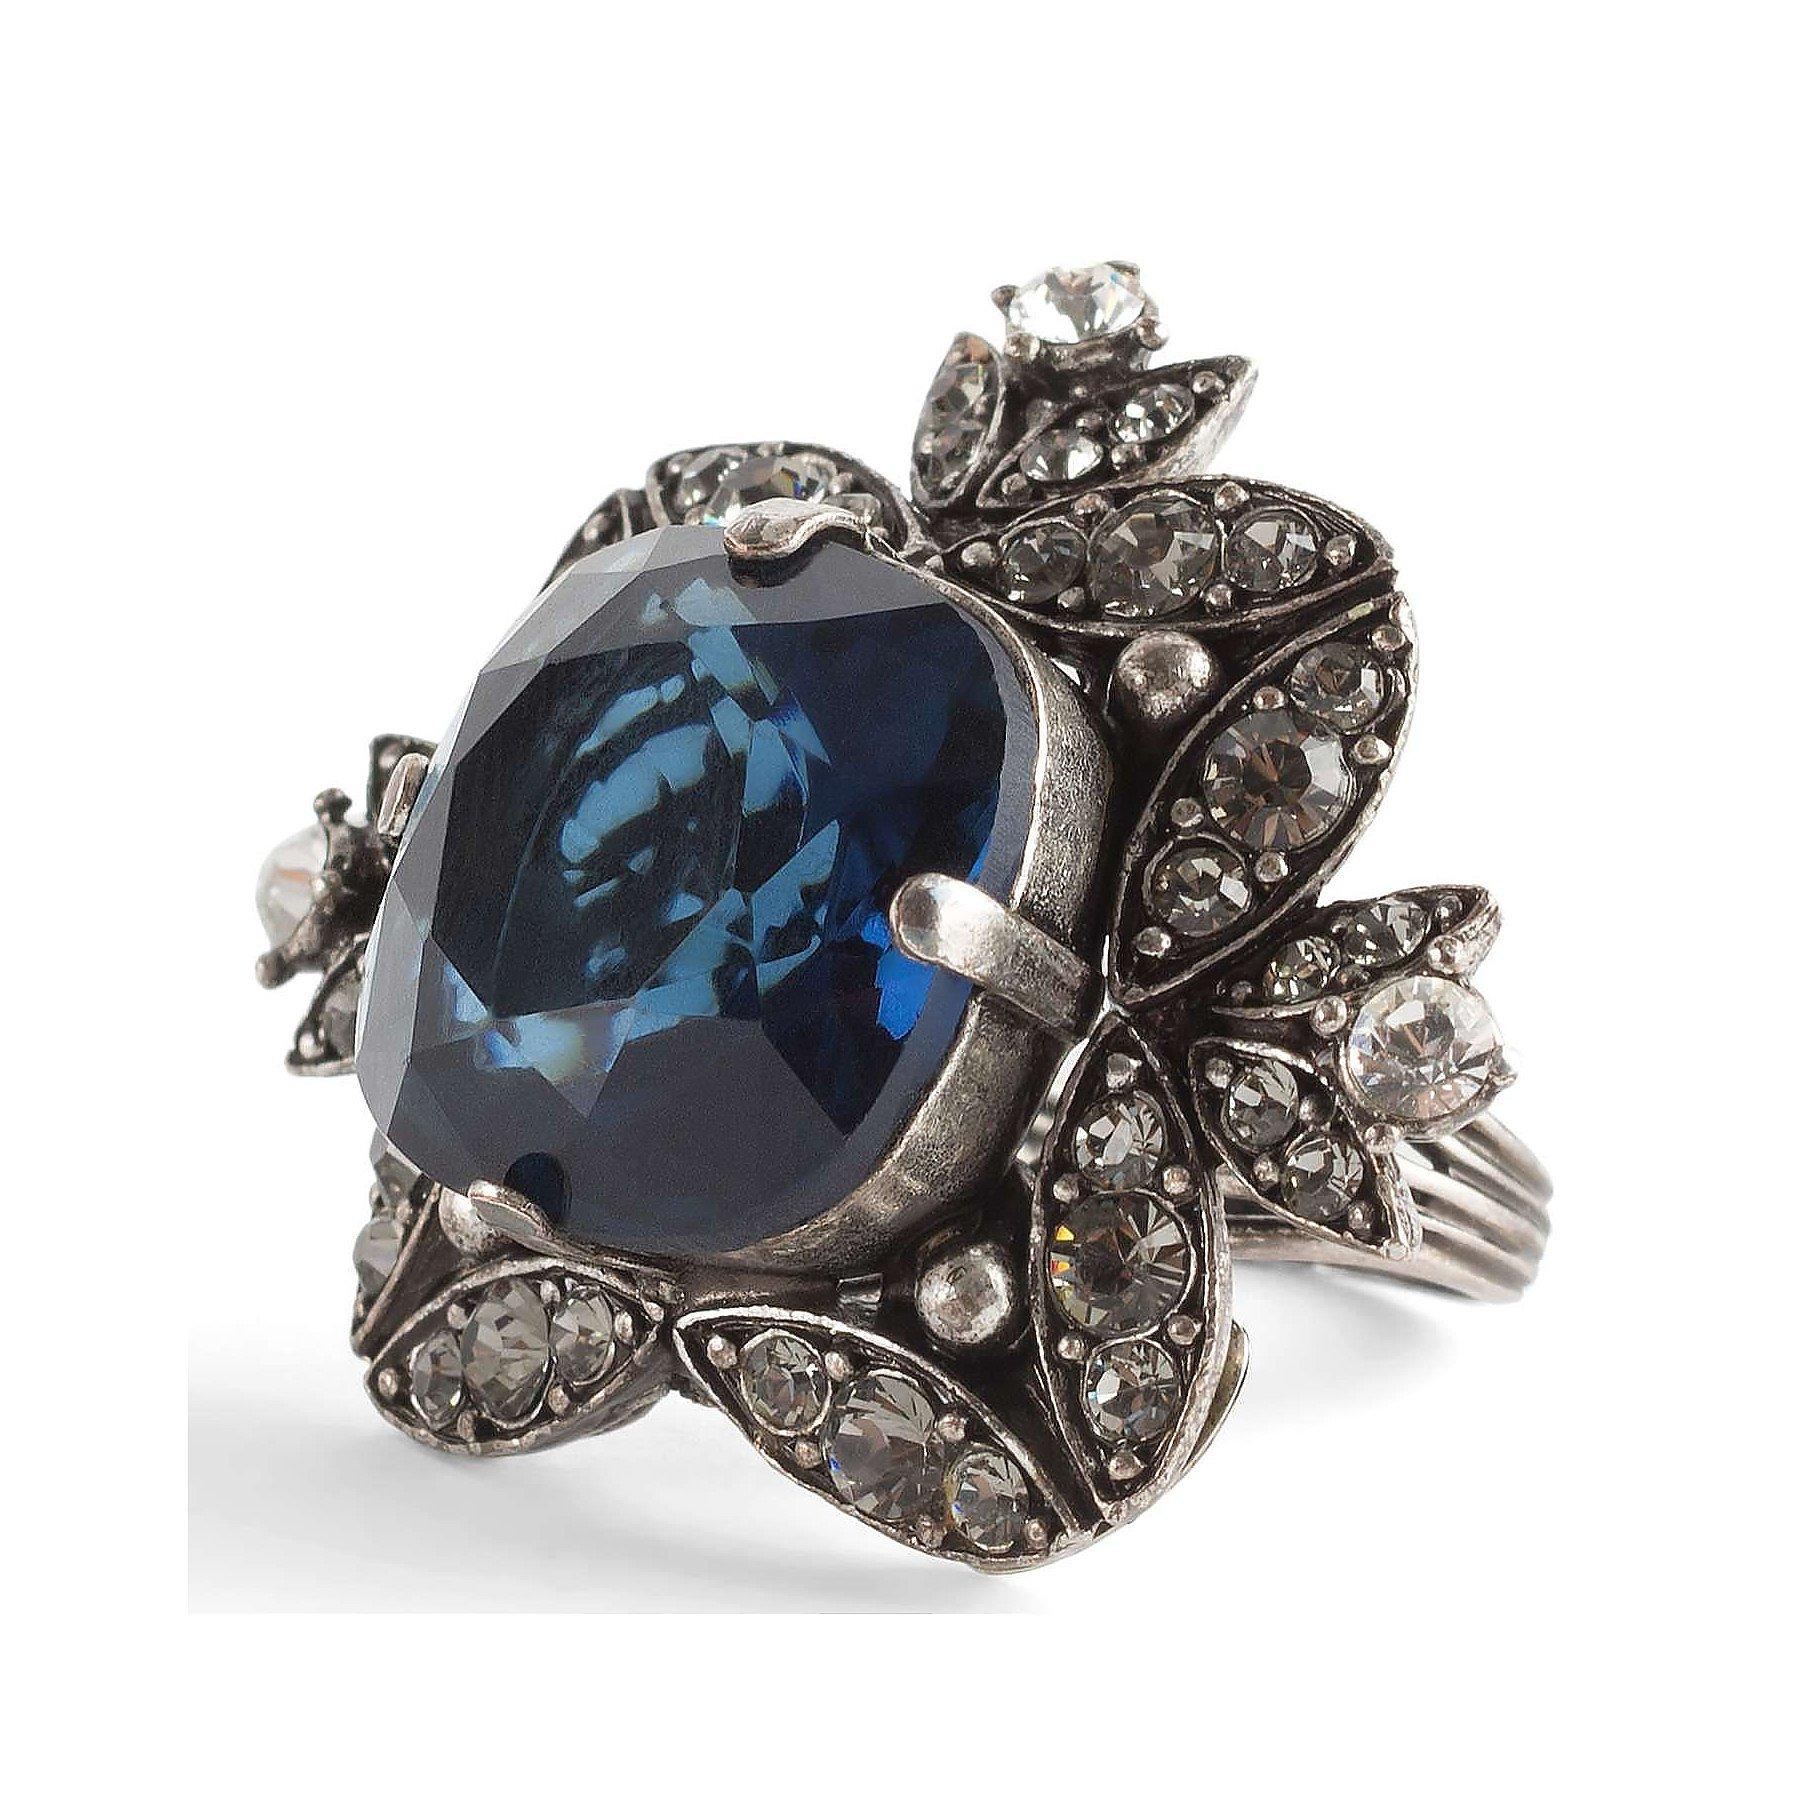 Lanvin Jewel Encrusted Ring